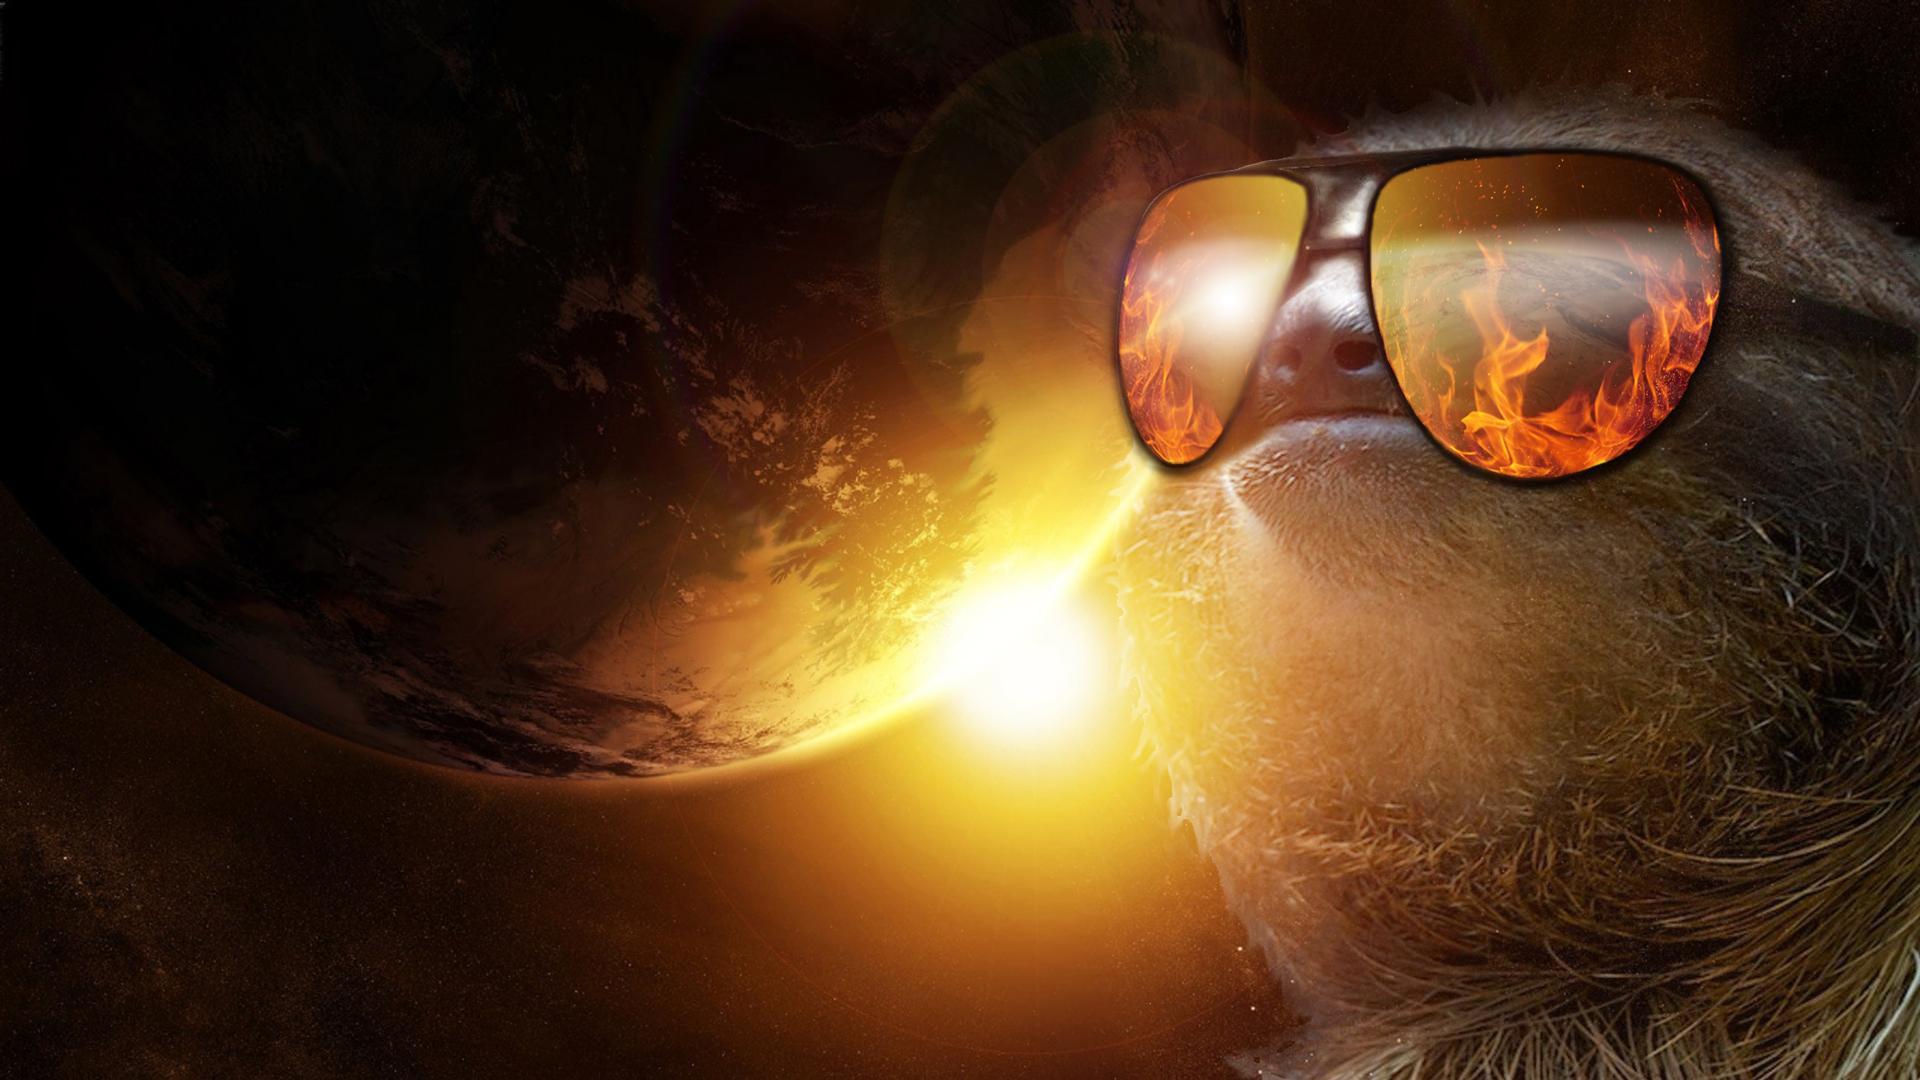 sloth sunglasses wallpaper